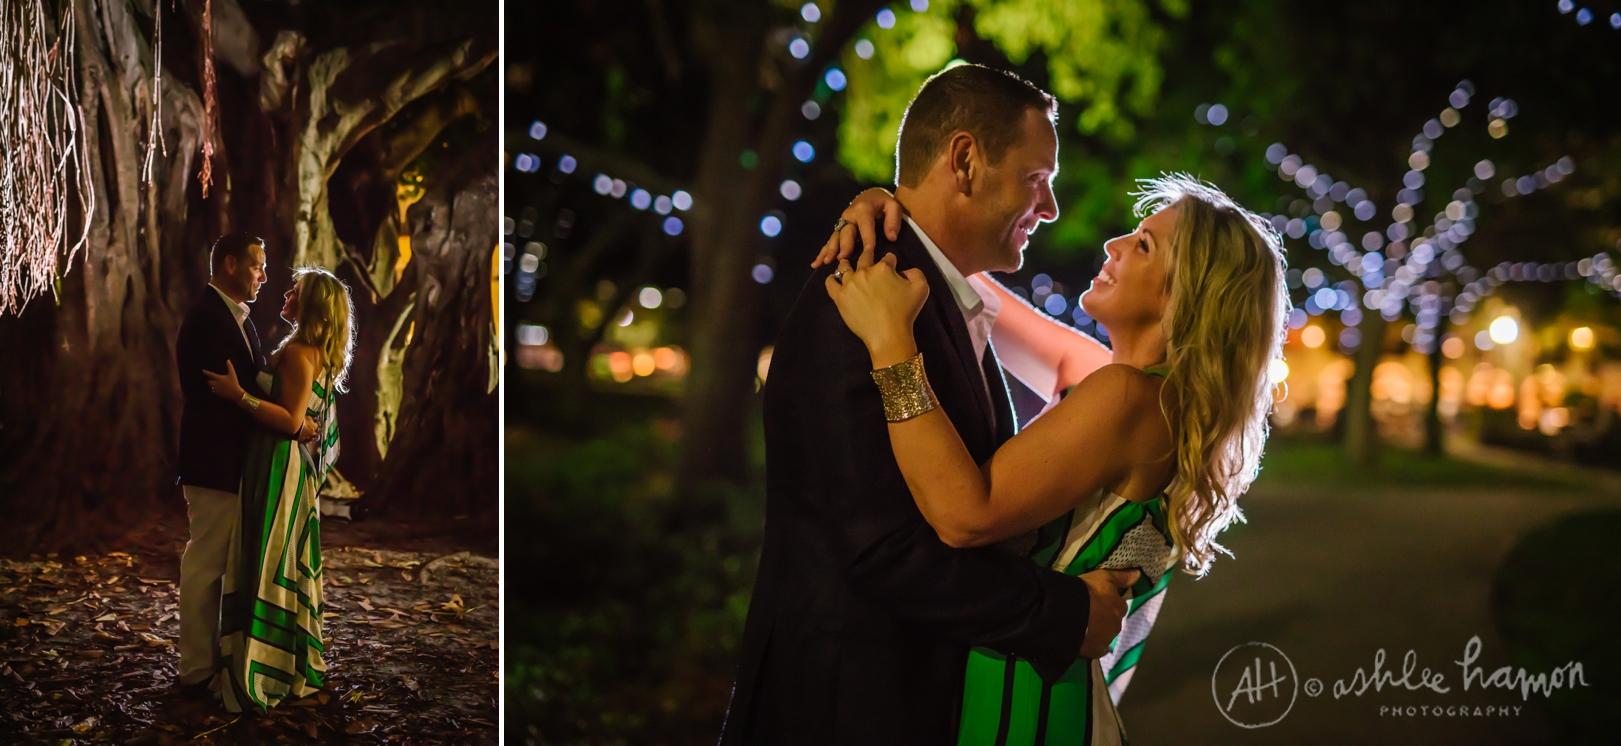 tampa-wedding-photographer-stylish-engagement_0009.jpg